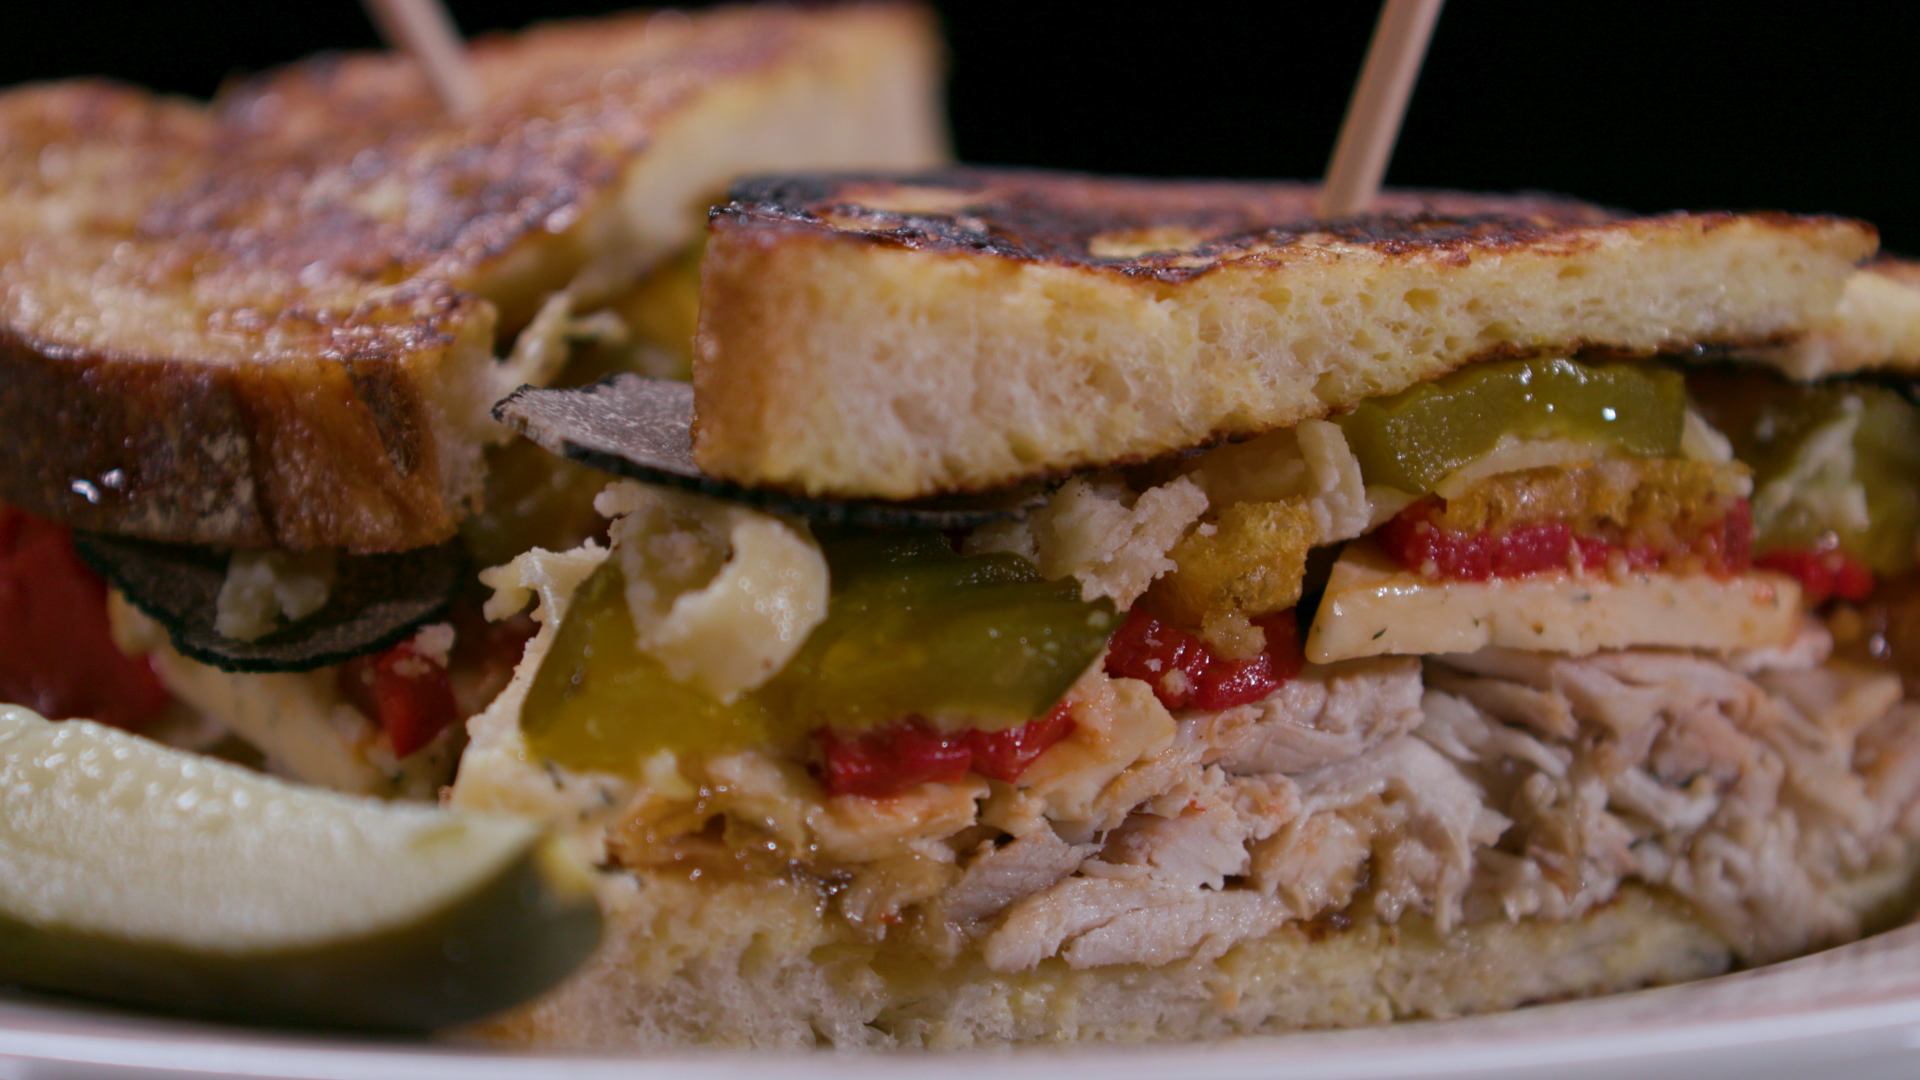 The Lance Bass Sandwich - TODAY.com